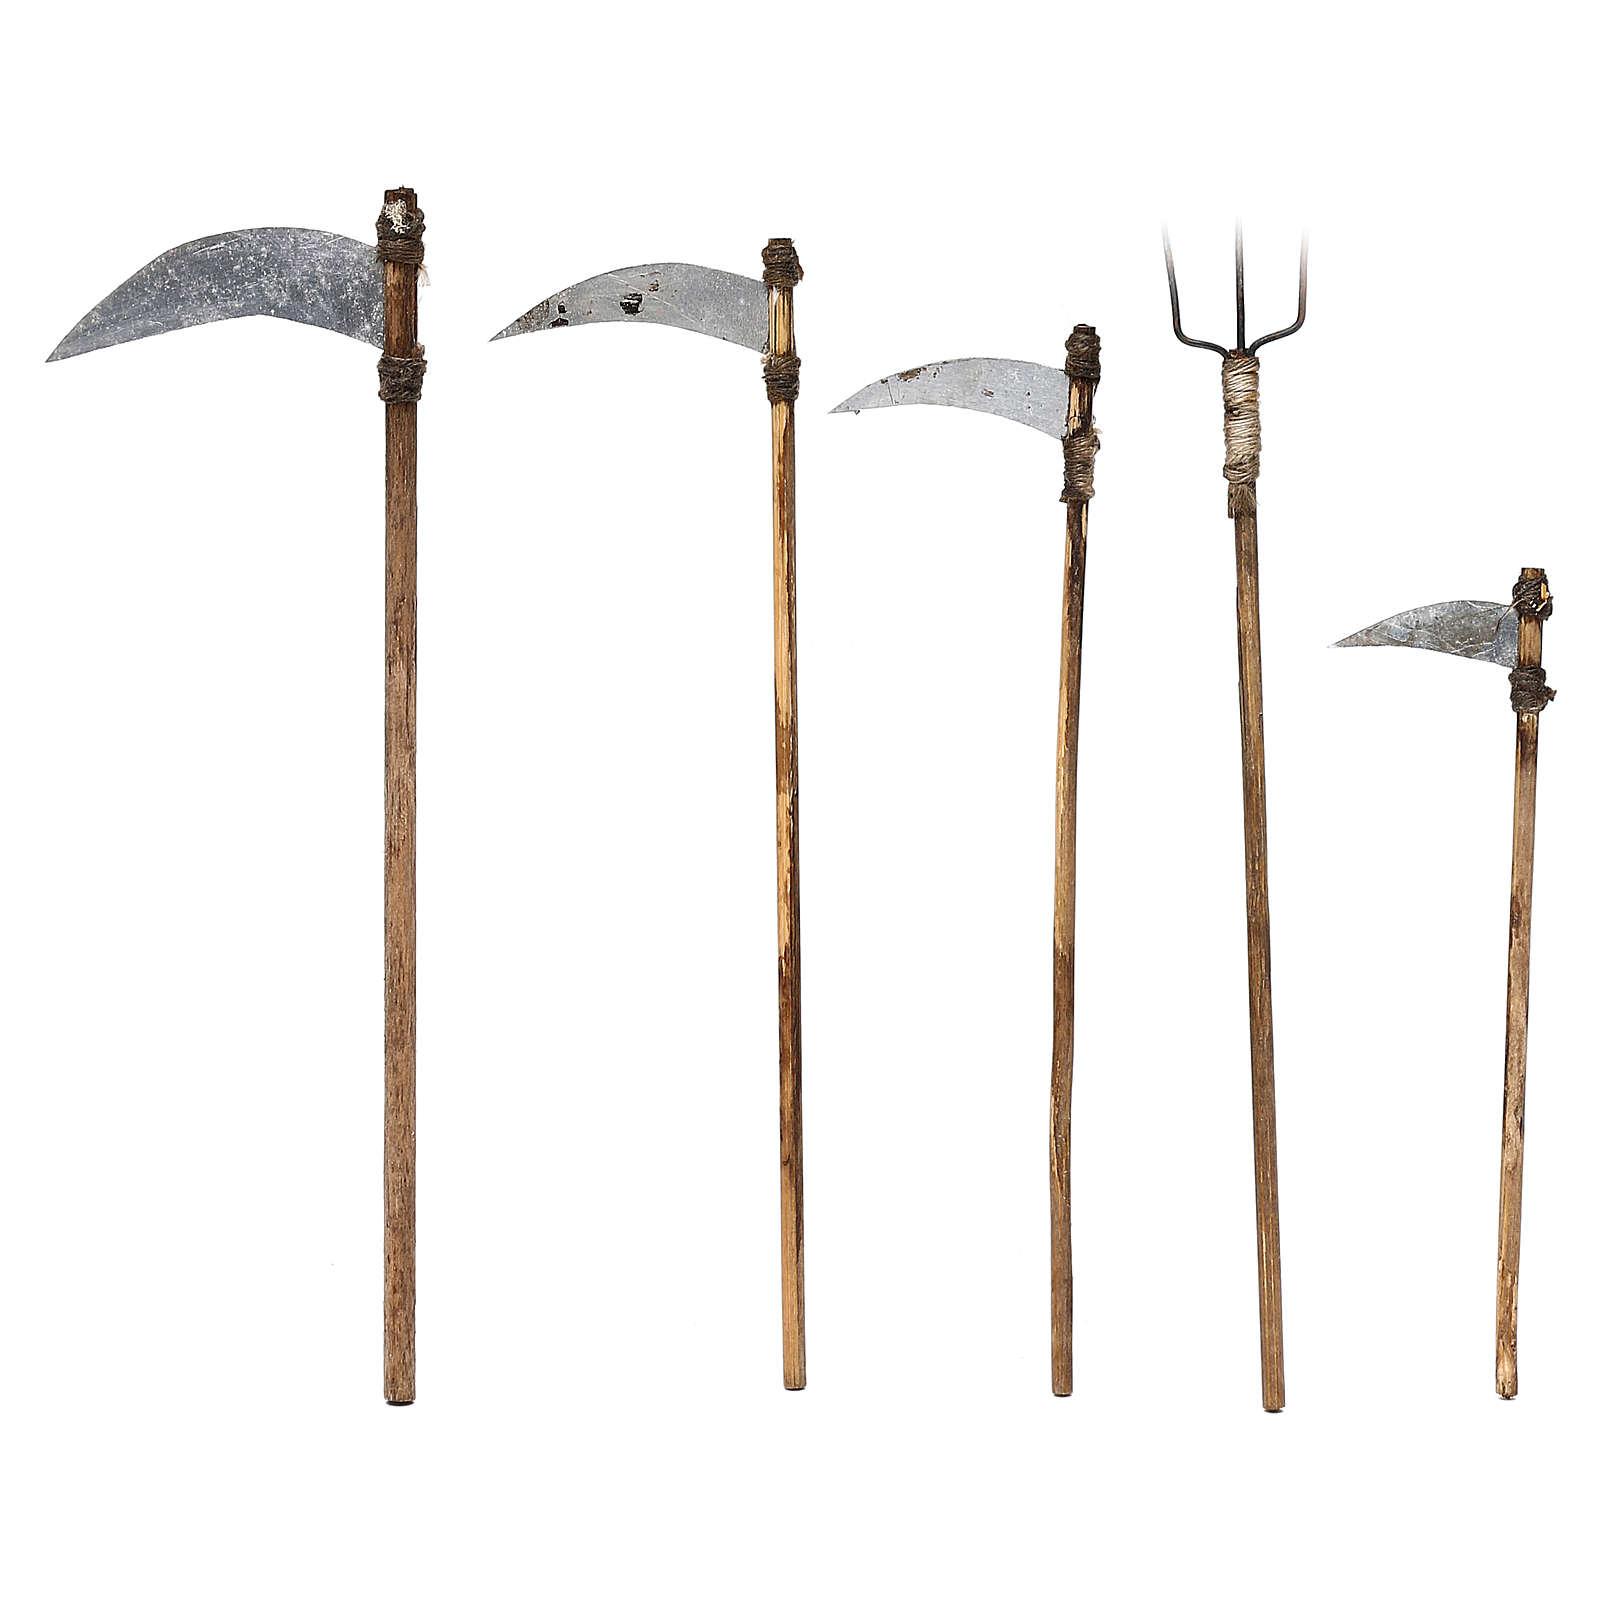 Five tools Neapolitan Nativity Scene 12 cm 4